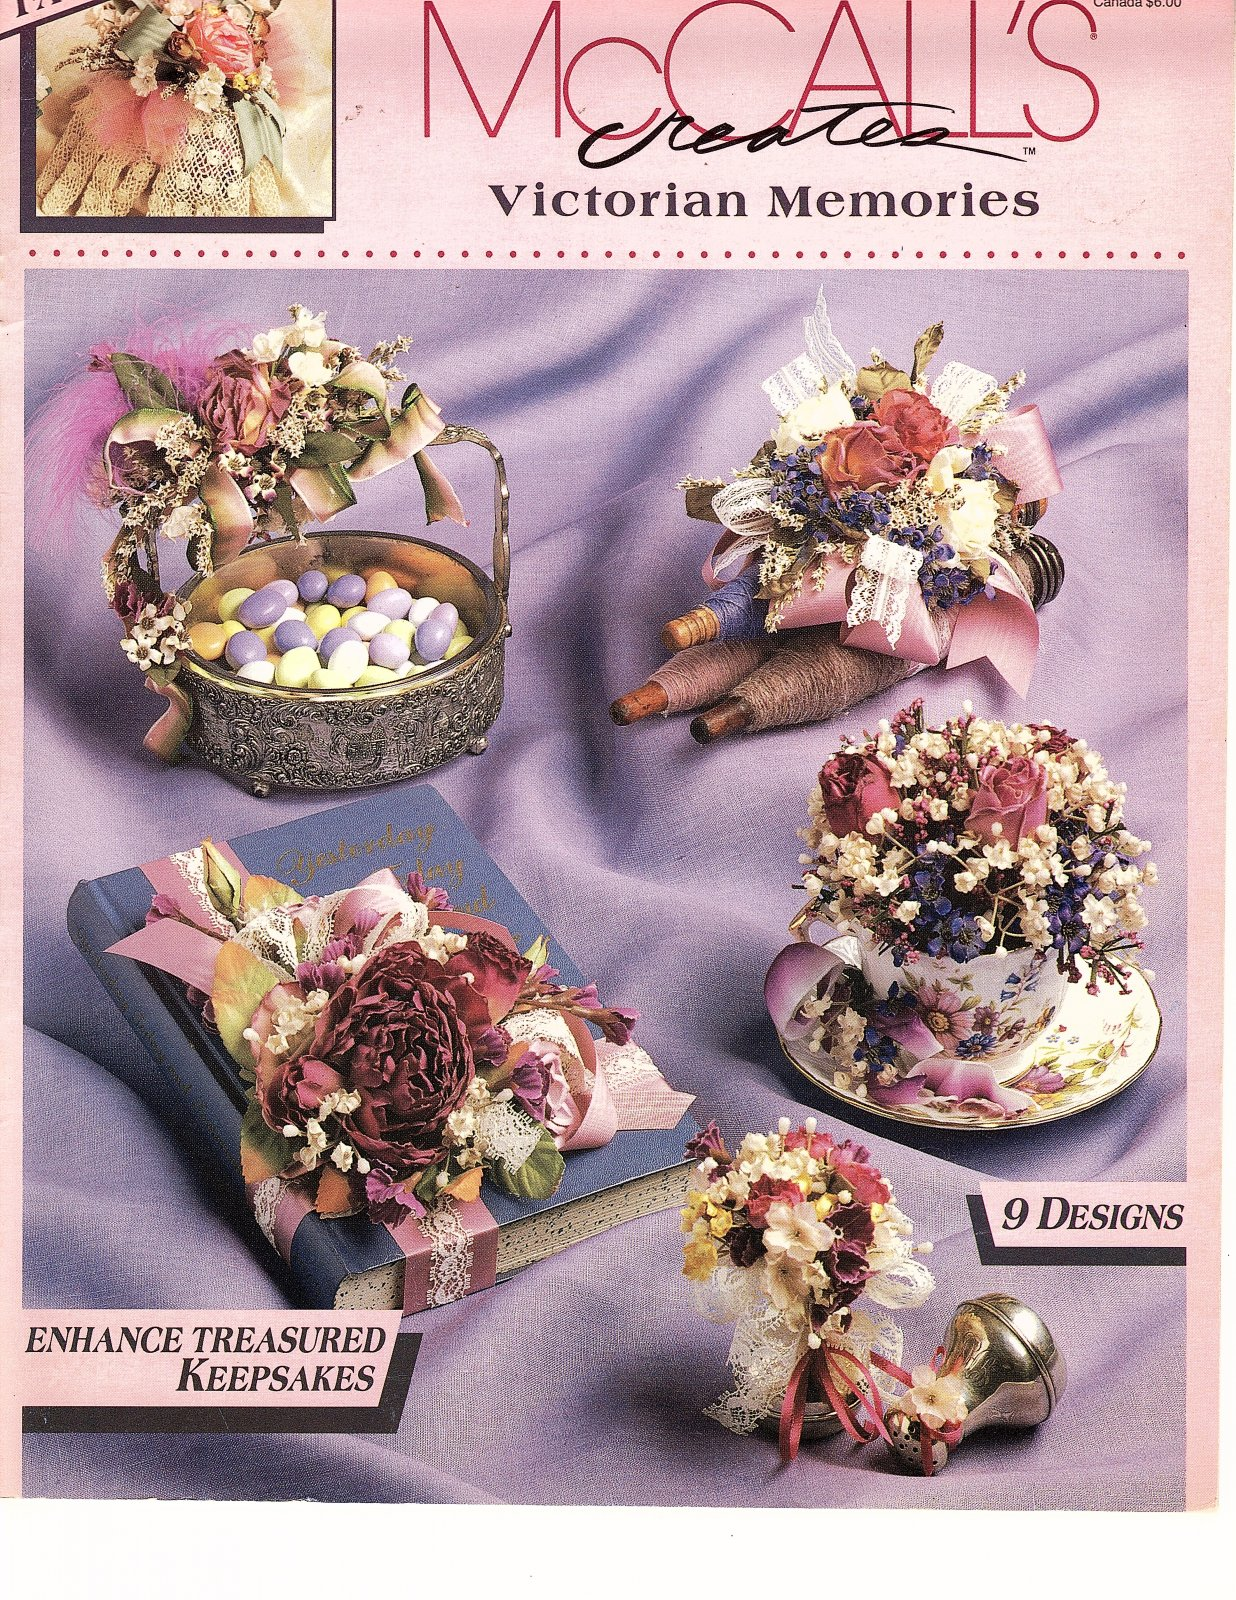 Victorian Memories by McCall's Creates - 9 Designs  Enhance treasured keepsakes